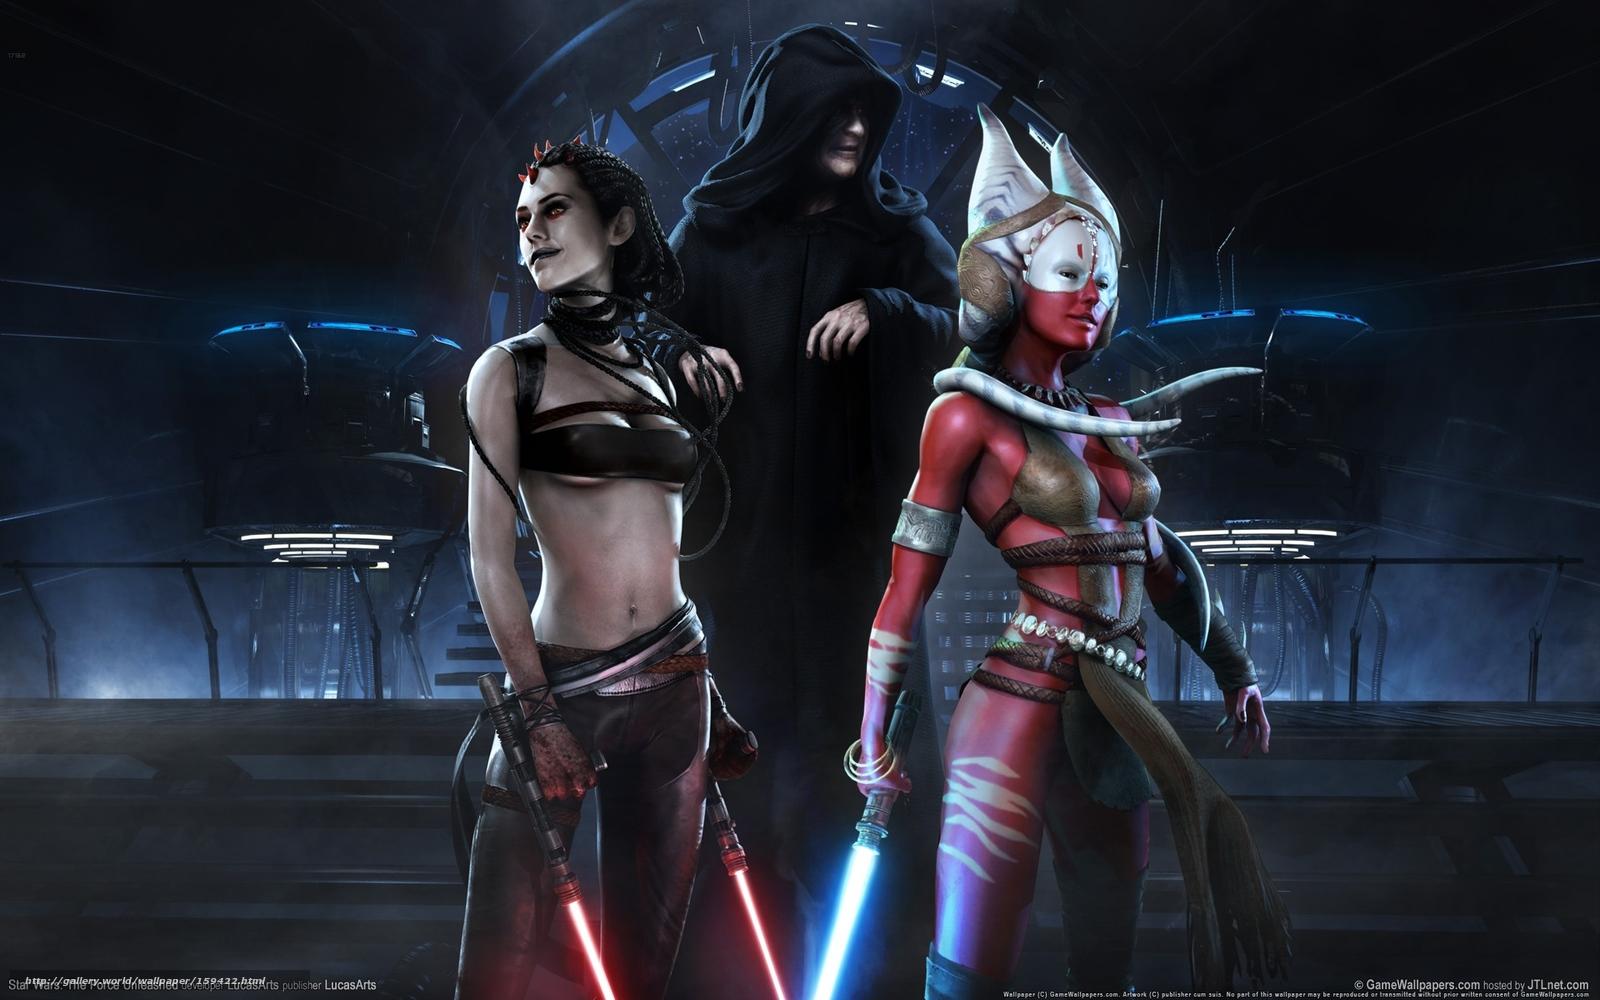 Star wars porn gam es hentay drunk pornstars